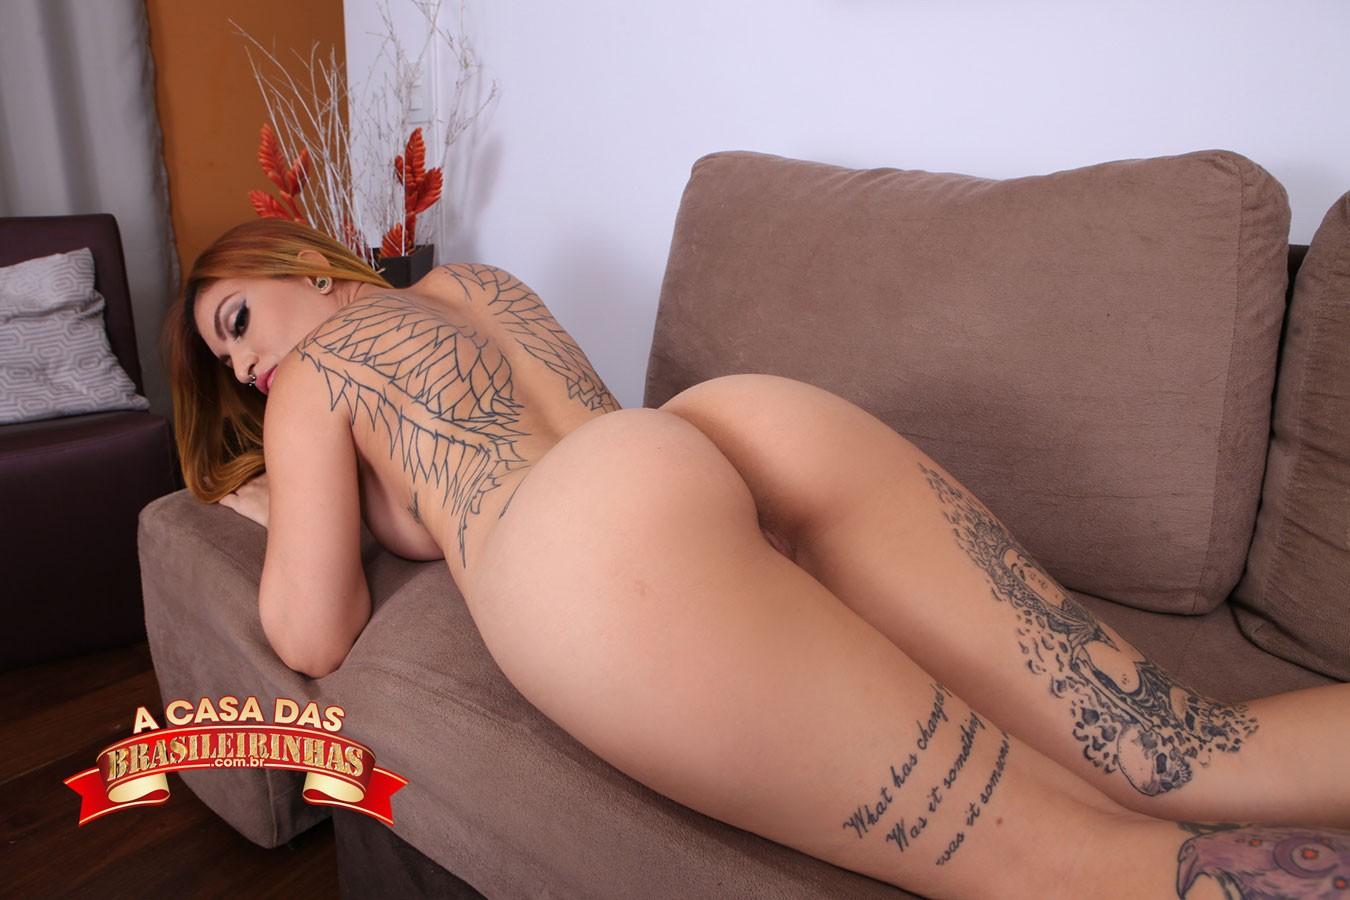 Rachell-Miranda-deitada-pelada-no-sofa.jpg